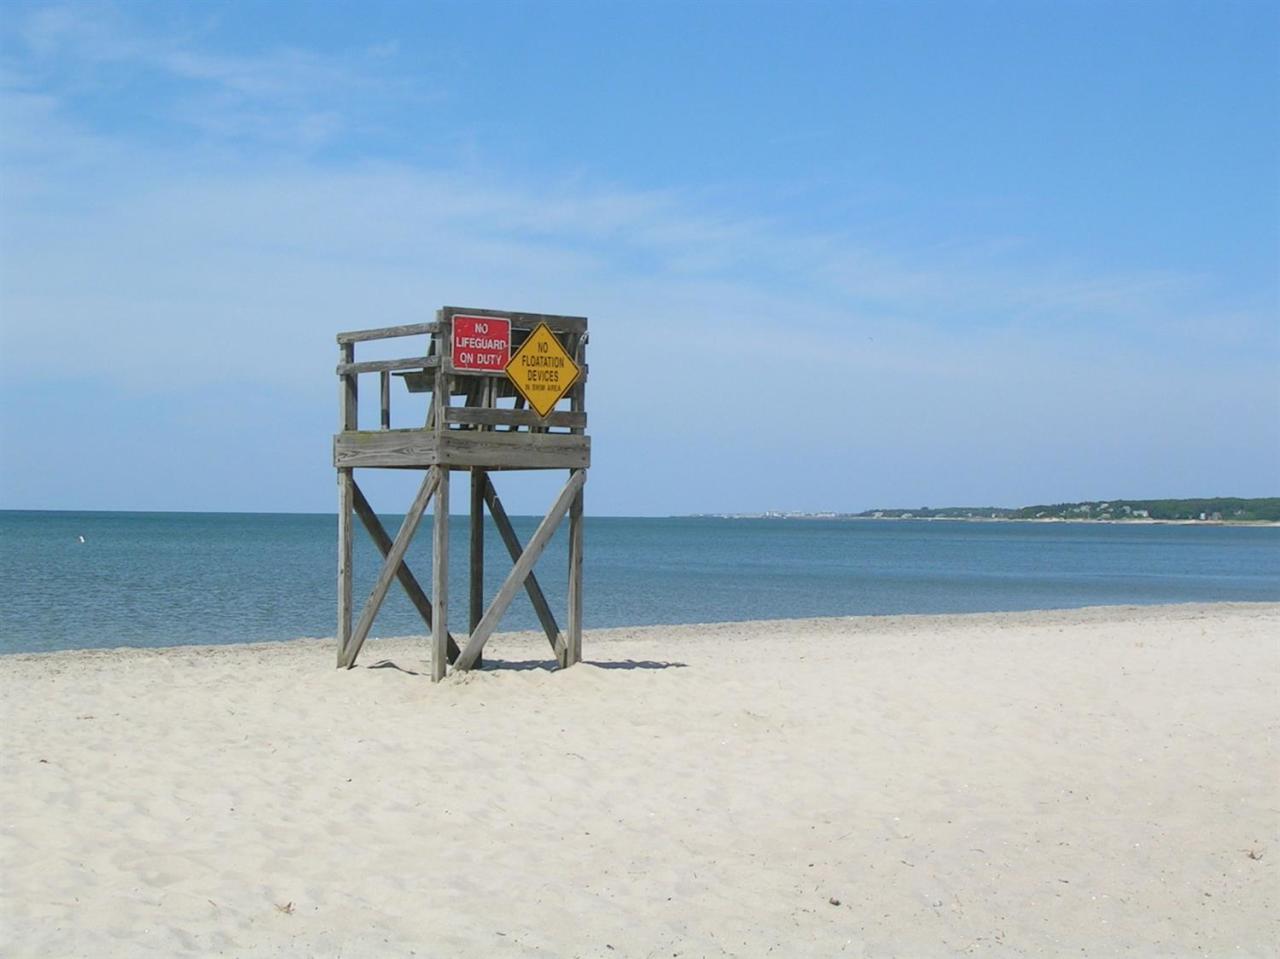 20 Hardings Beach Road, Chatham MA, 02633 - slide 27